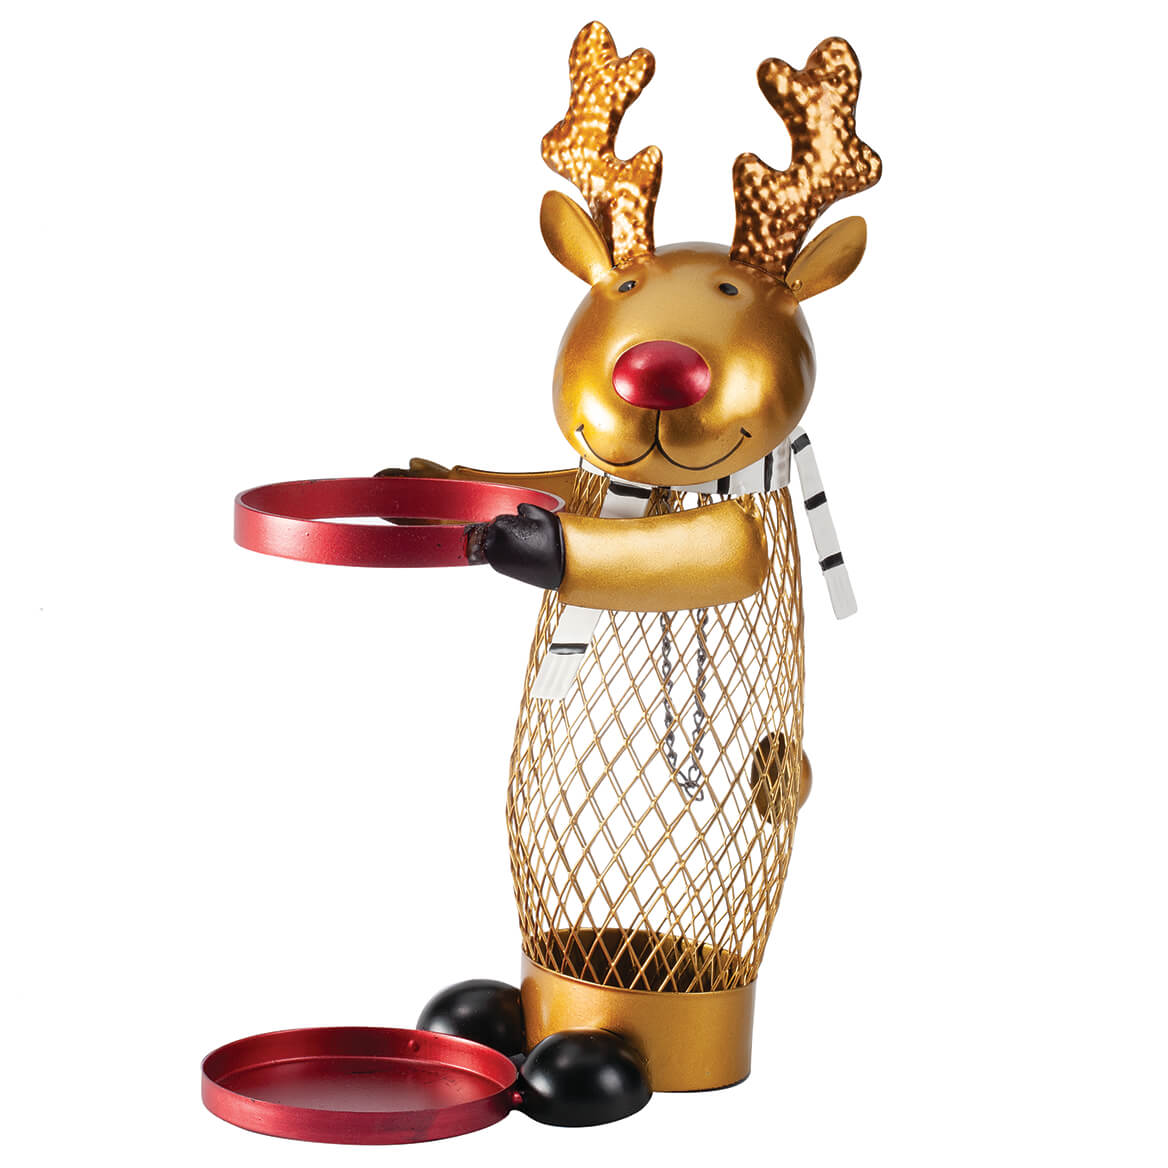 Metal Reindeer Cork and Wine Holder-370886